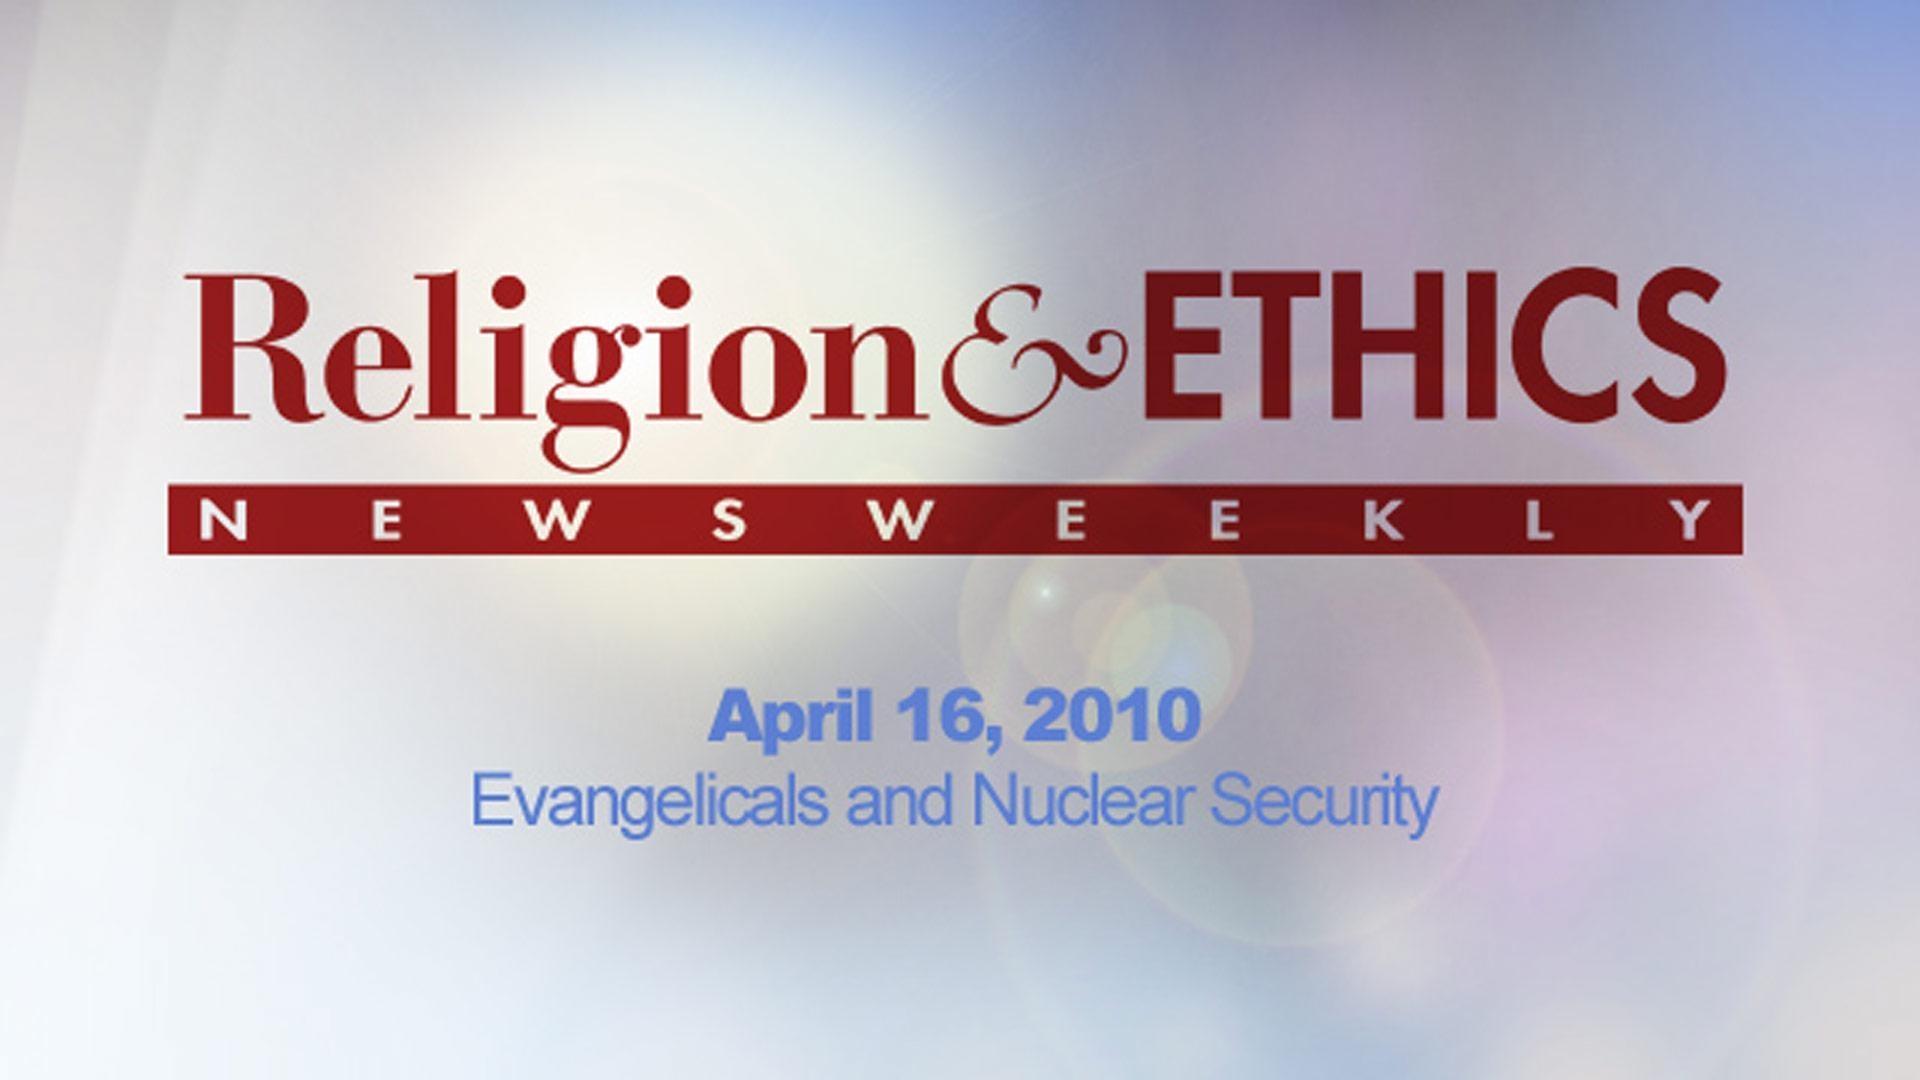 April 16, 2010 image